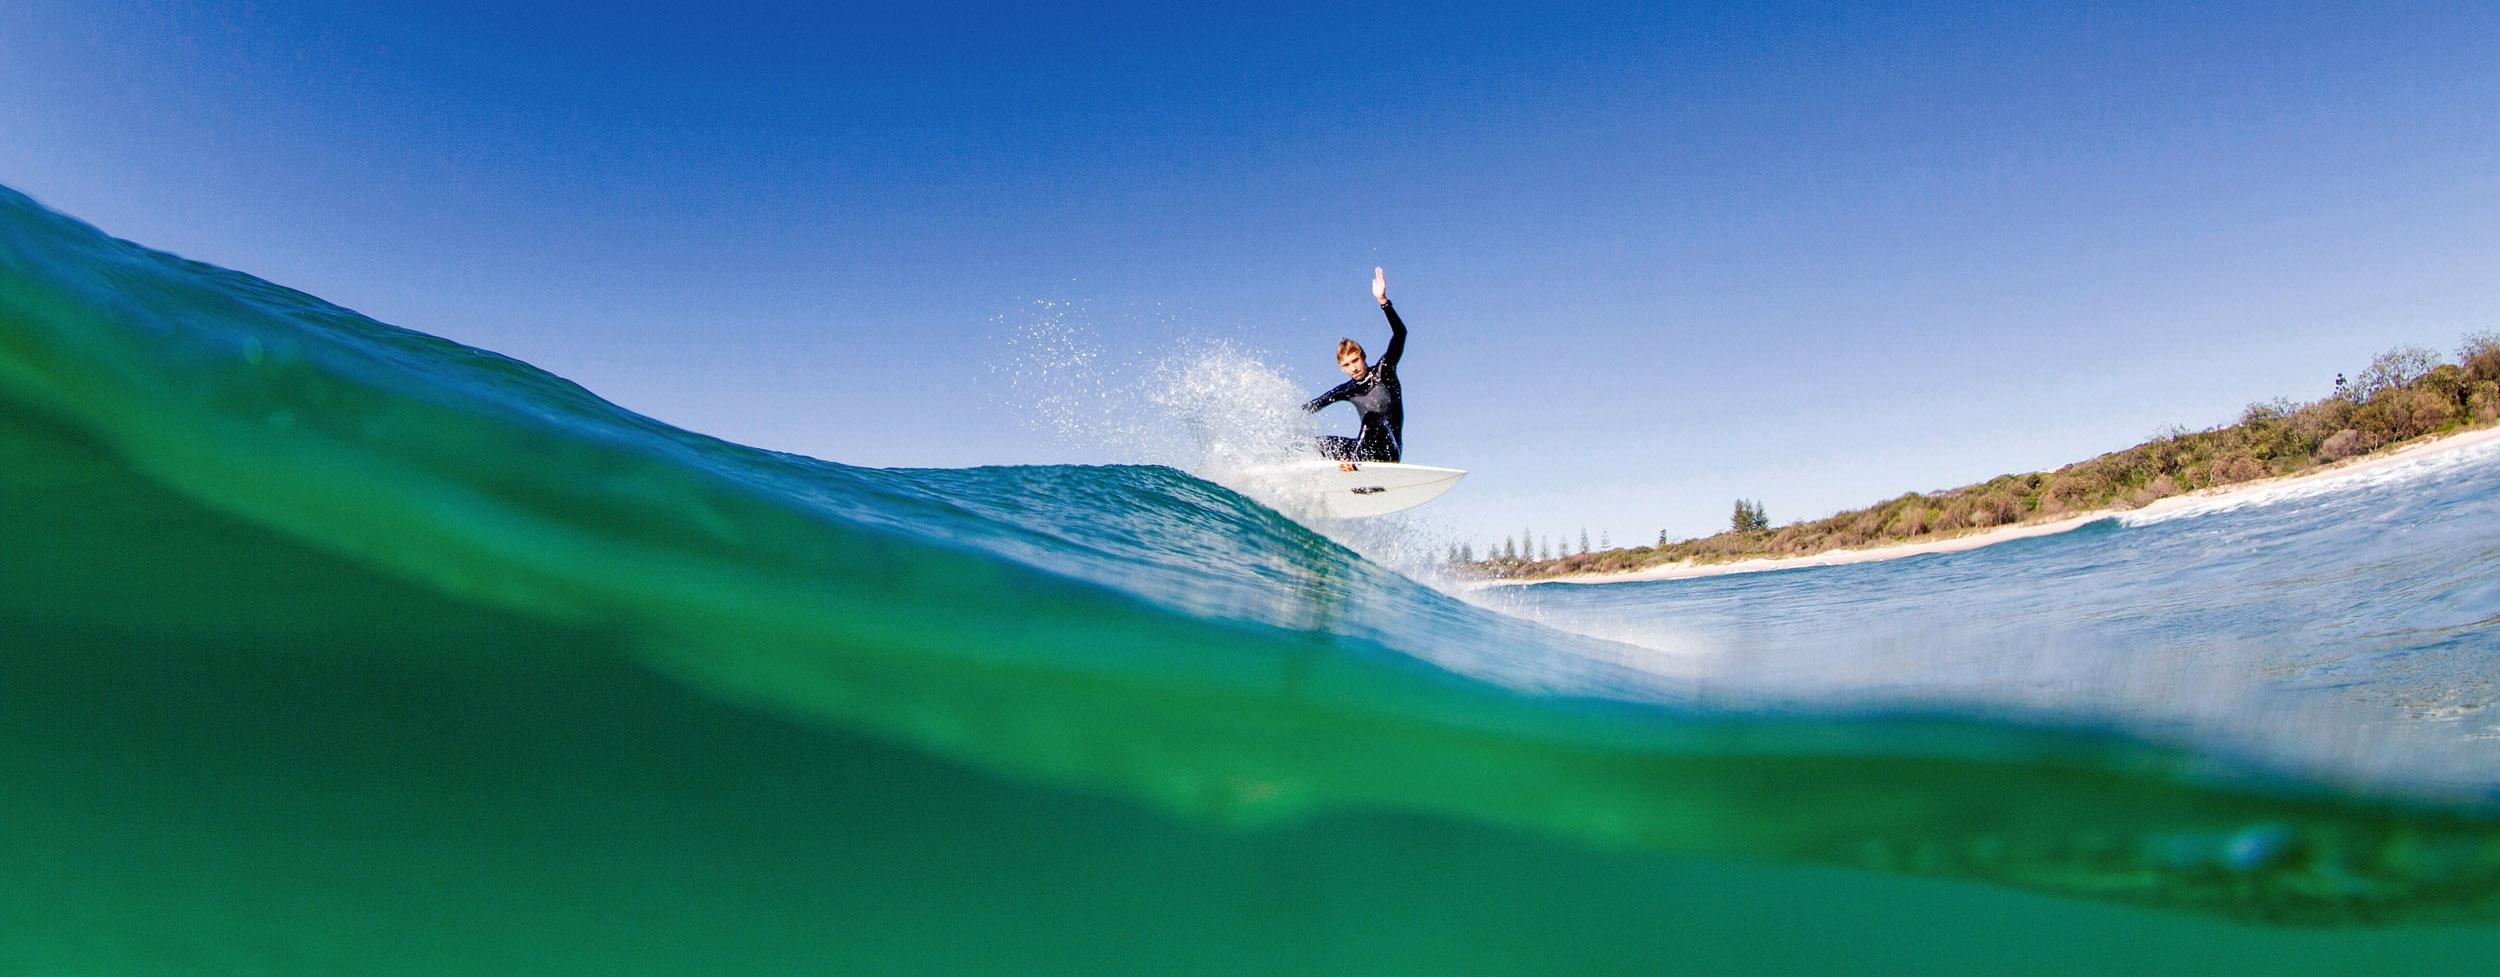 surfing-australia-HPC-288a.jpg